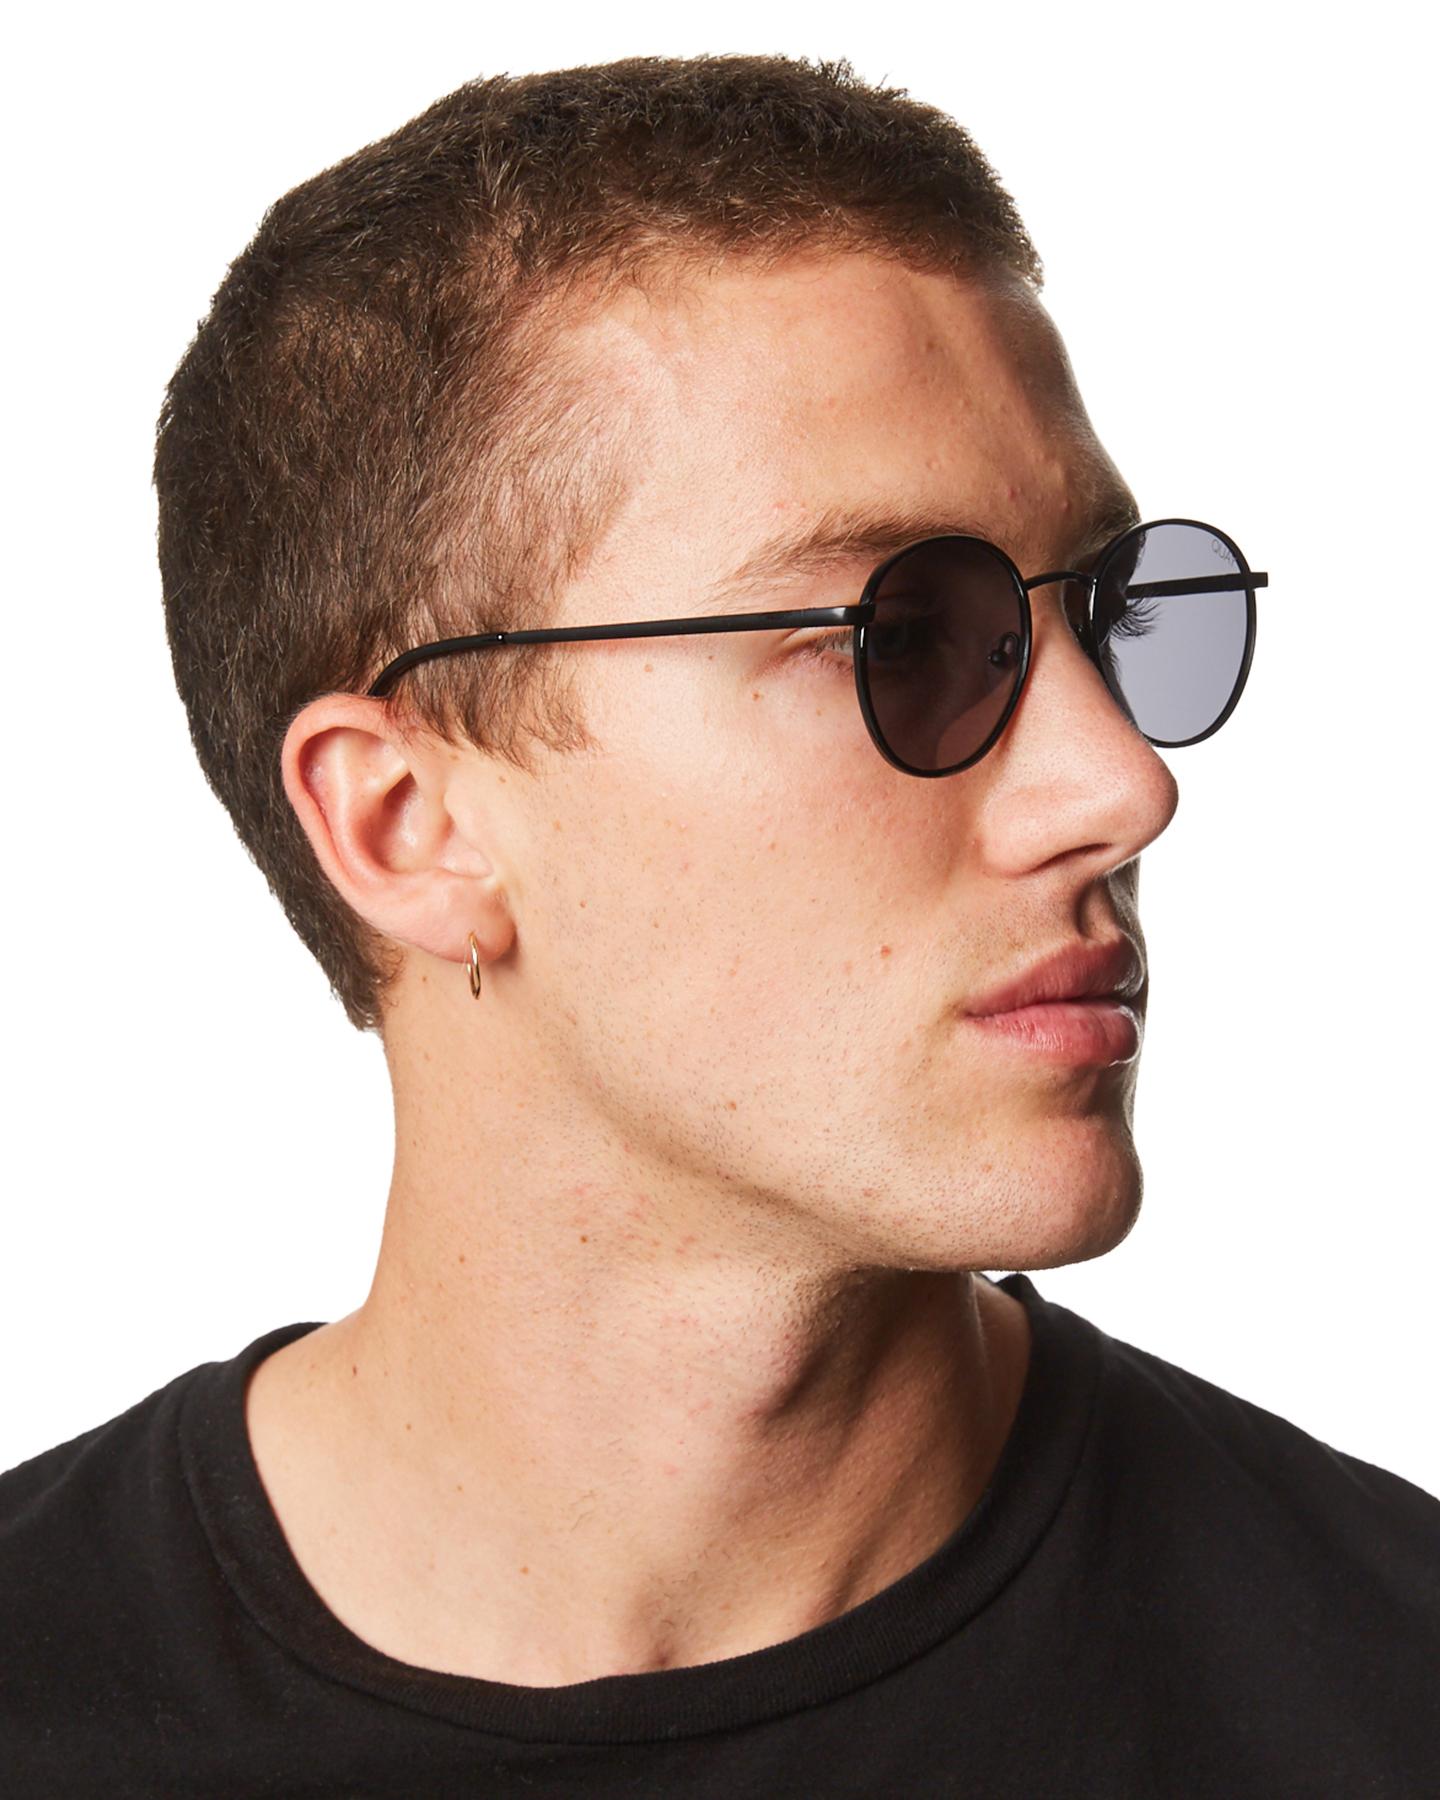 f359618b55 Oops Source · New Quay Eyewear Men s X Barney Cools Omen Sunglasses Glass  Brown eBay